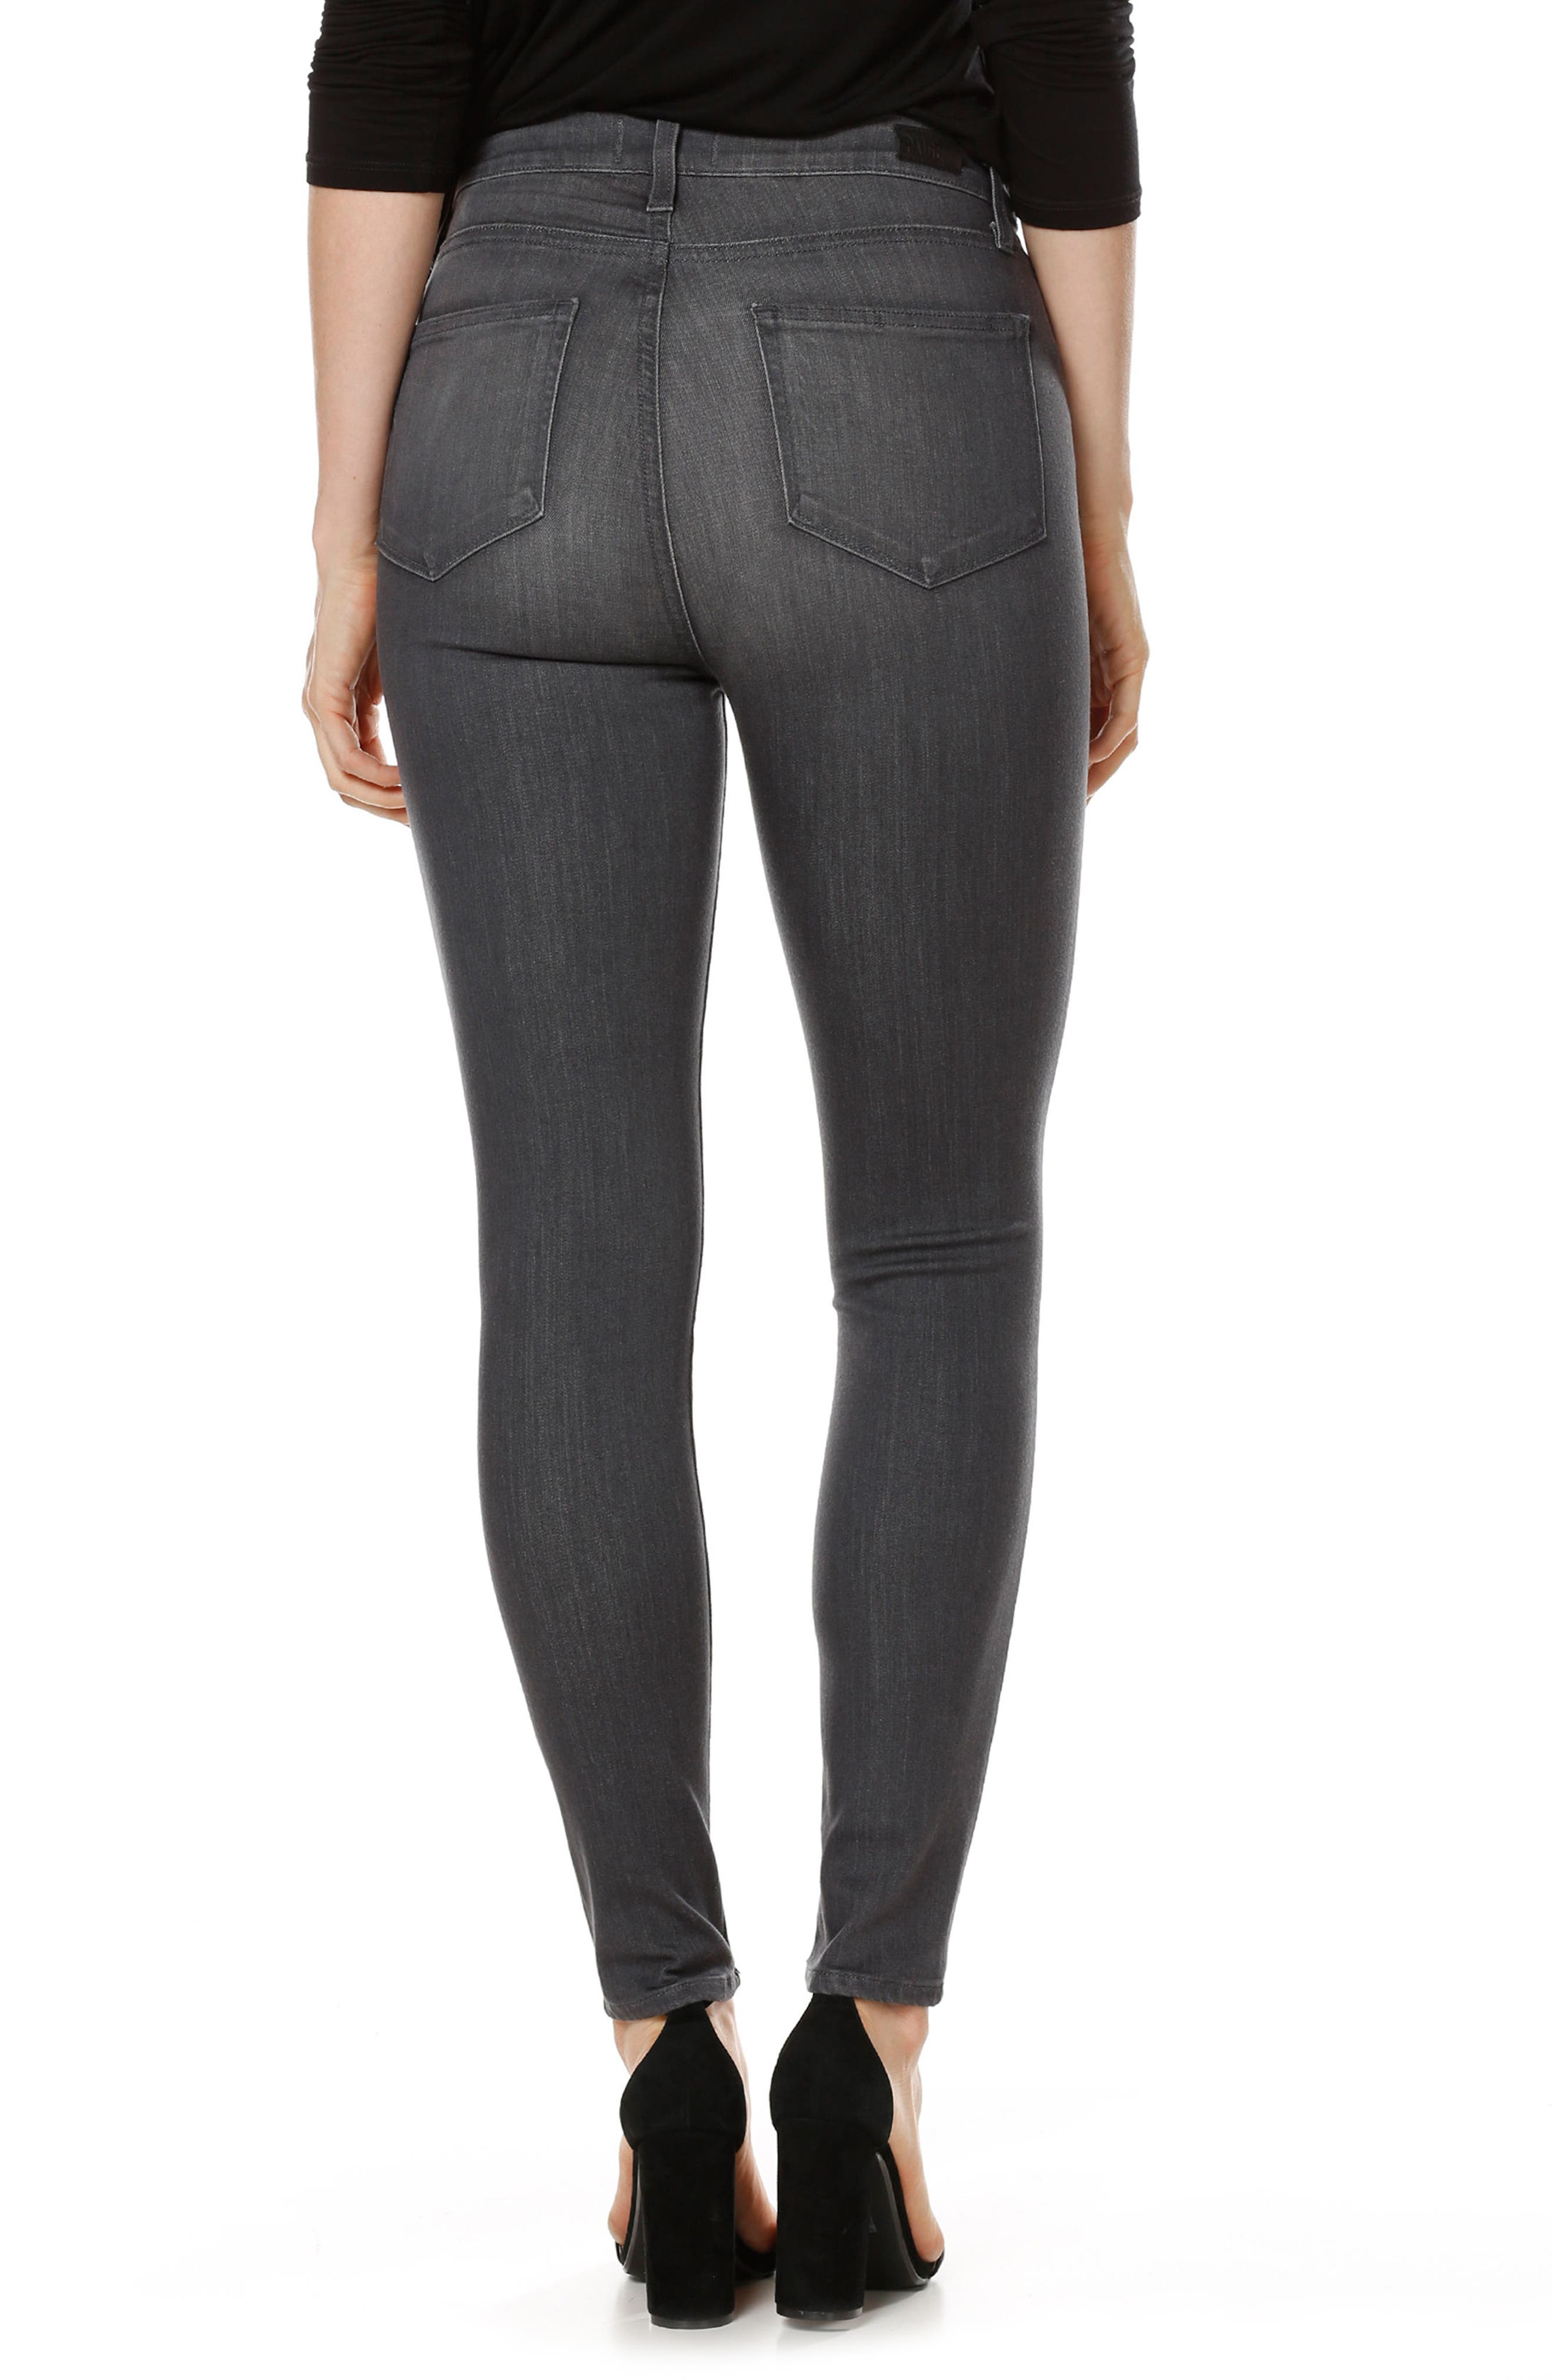 Transcend - Margot High Waist Ankle Ultra Skinny Jeans,                             Alternate thumbnail 2, color,                             Summit Grey